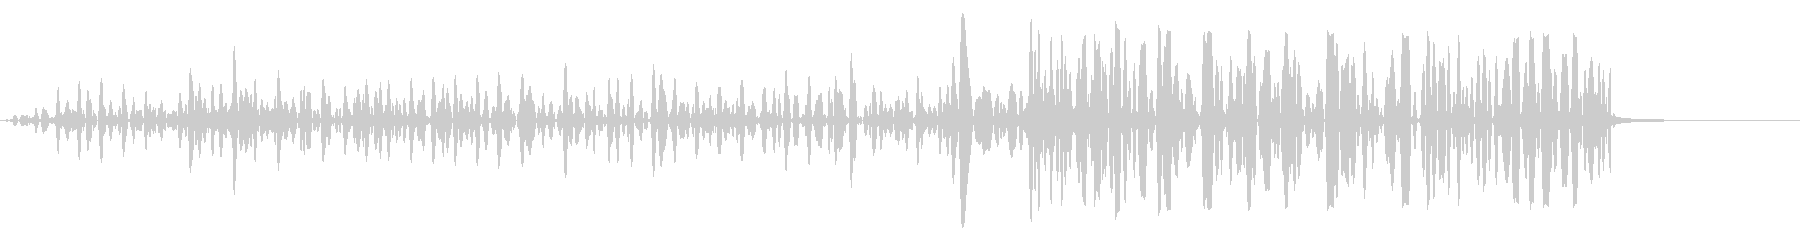 SynthStatic EC03_...の未再生の波形